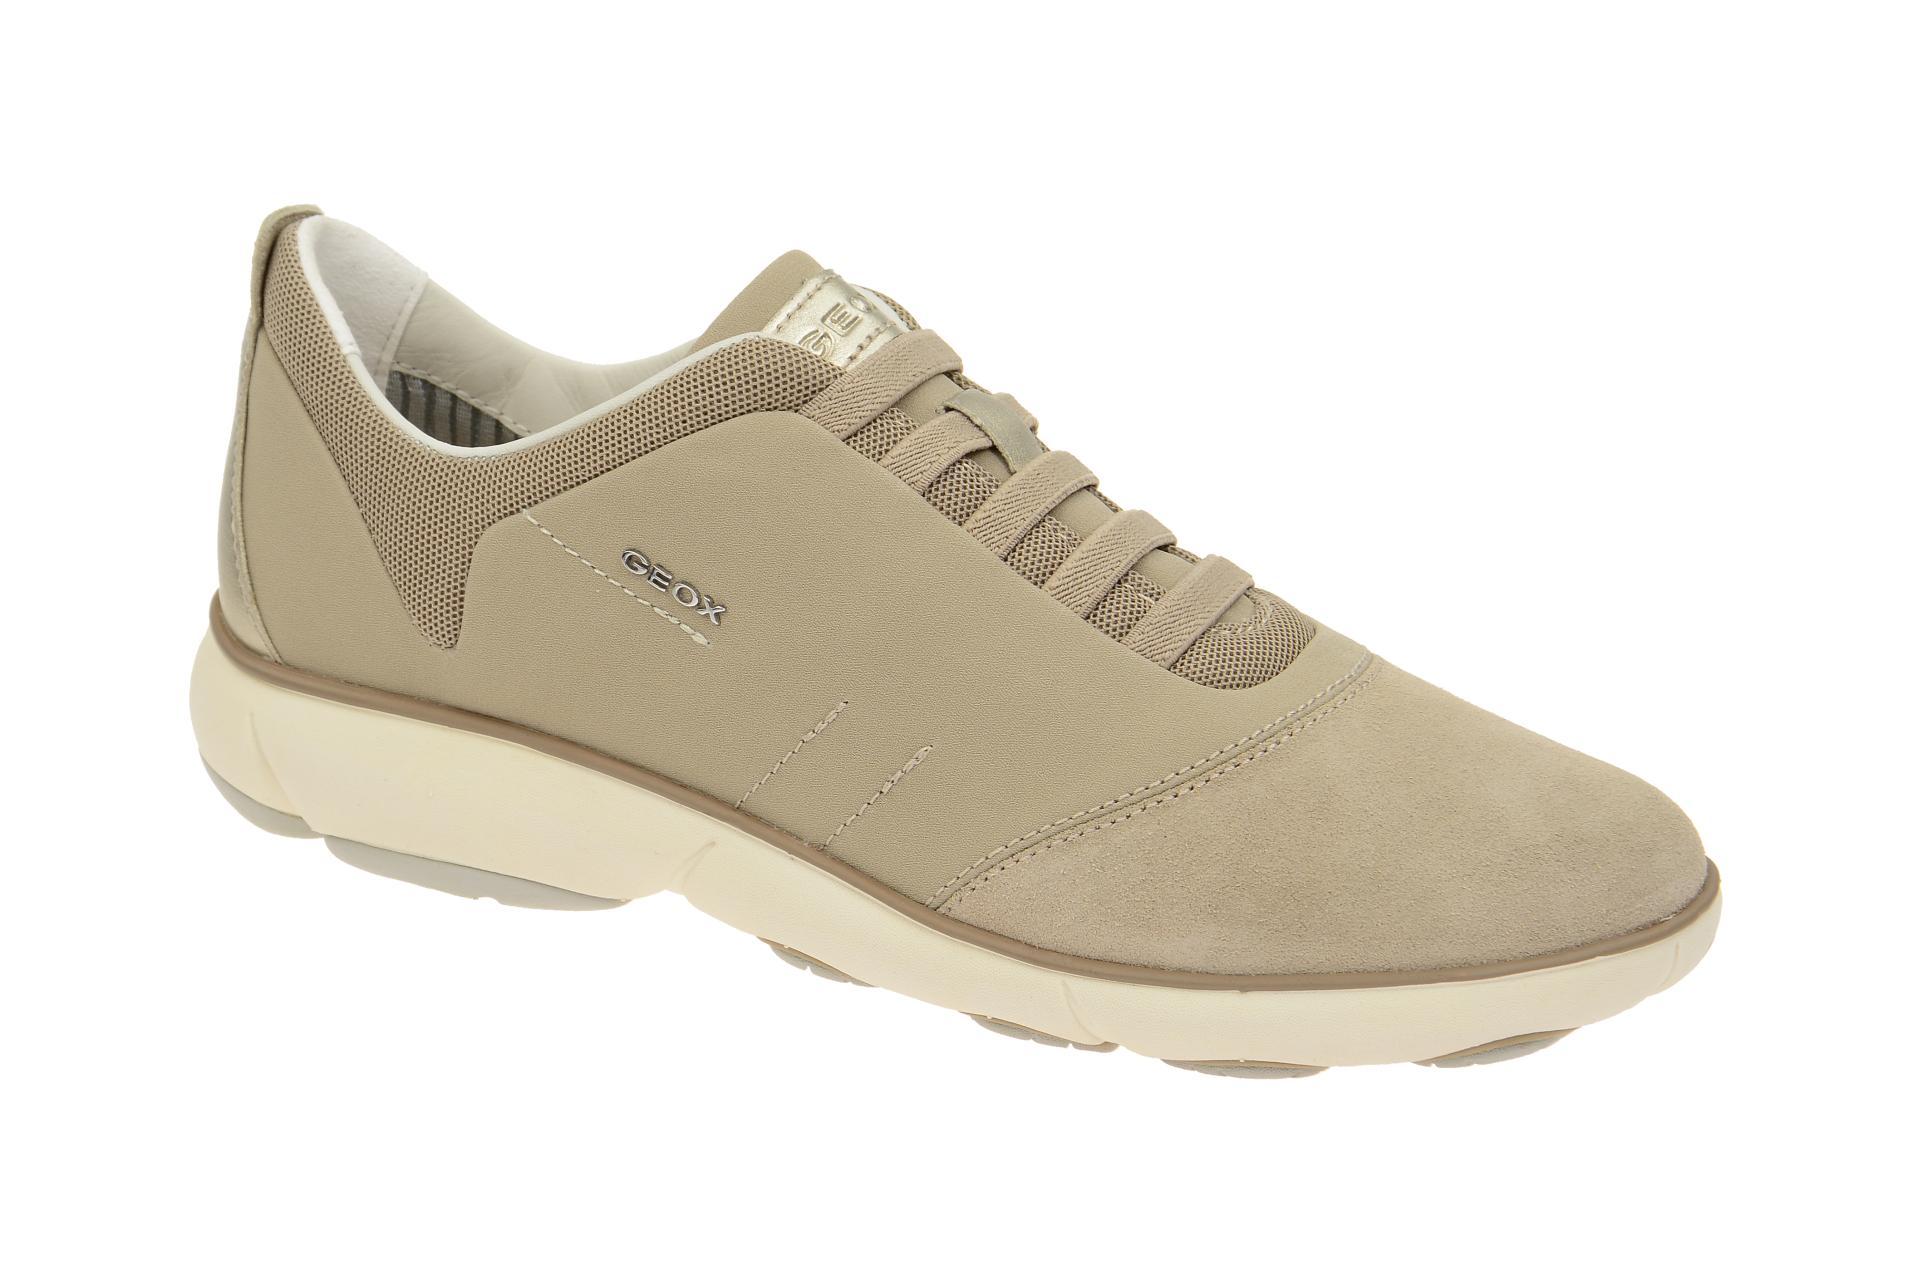 Geox D Nebula C Damen Damen Damen Wasserdicht Slip On Schuhe